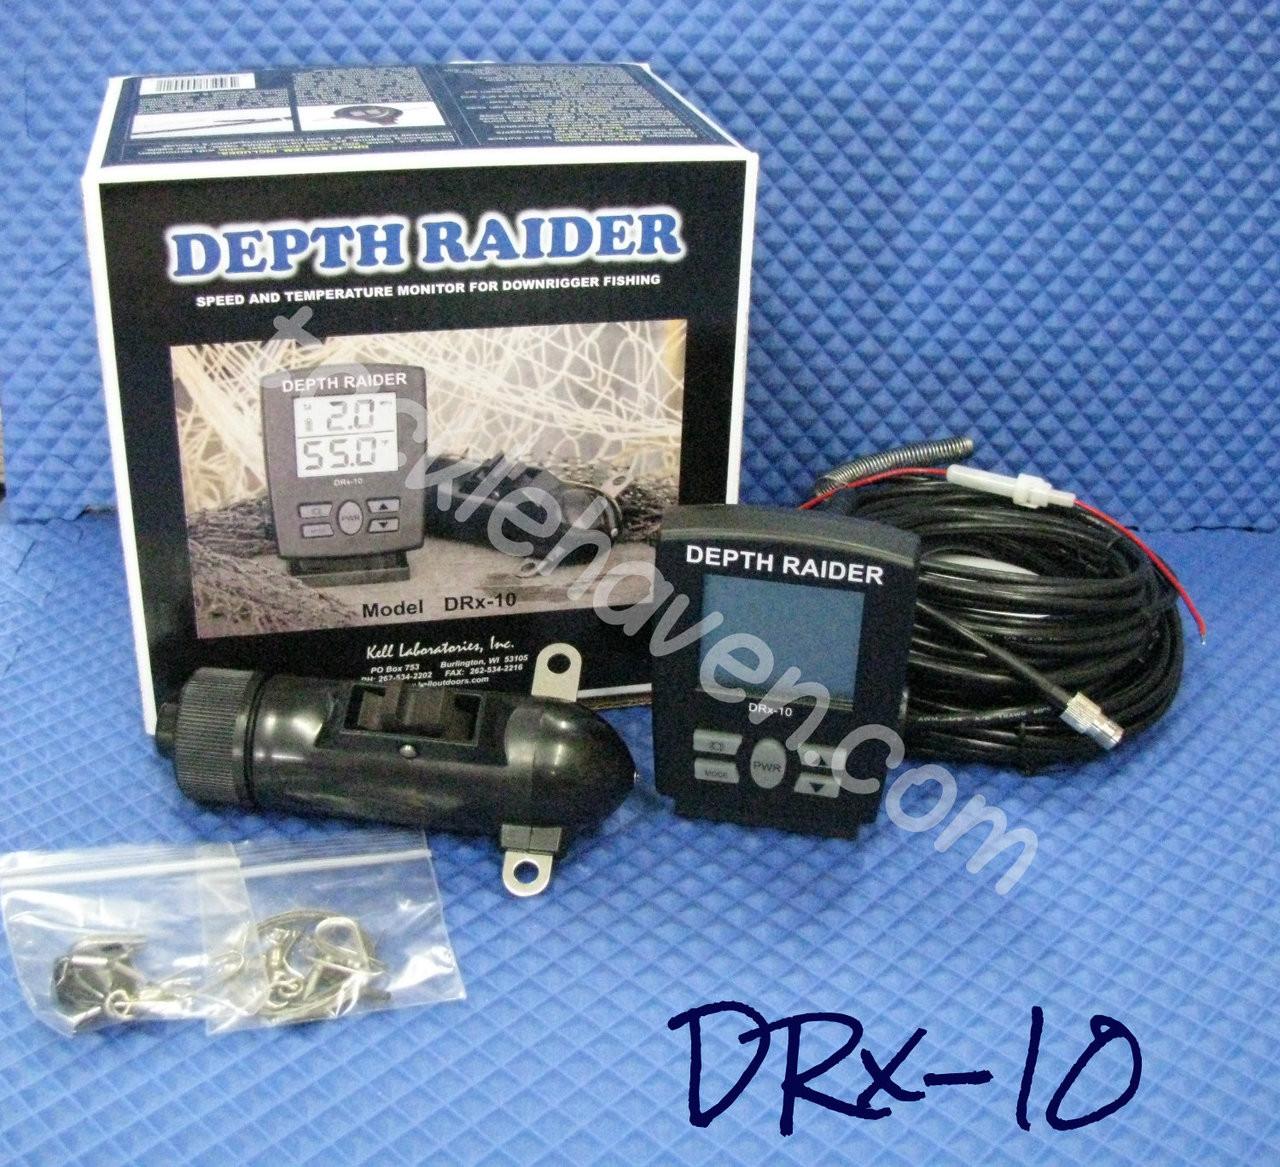 KELL DEPTH RAIDER SPEED AND TEMP UNIT #DRx-10